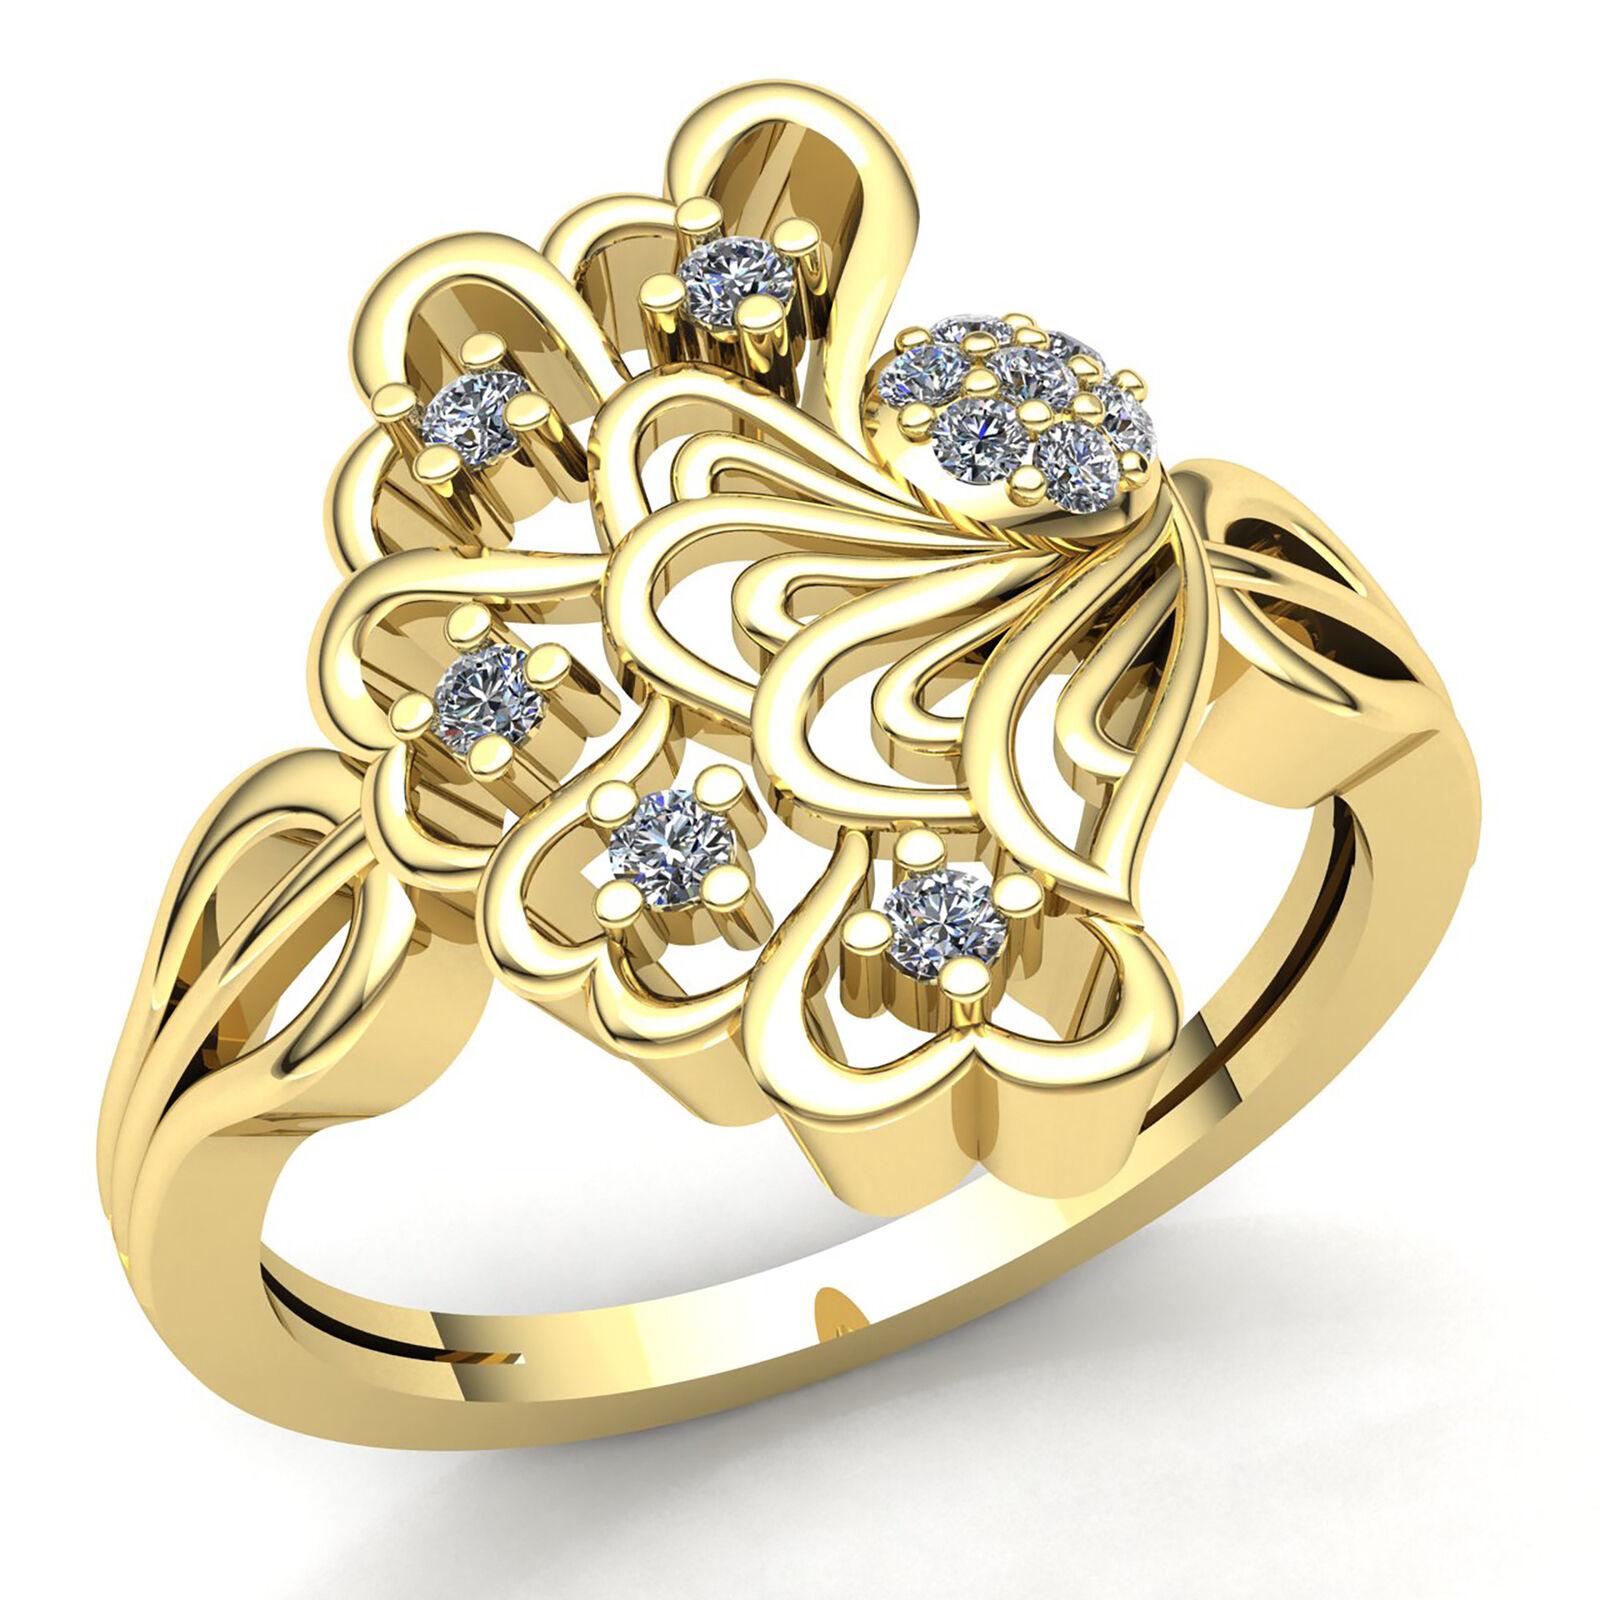 Genuine 0.2ctw Round Cut Diamond Ladies Fancy Heart Anniversary Ring 14K gold